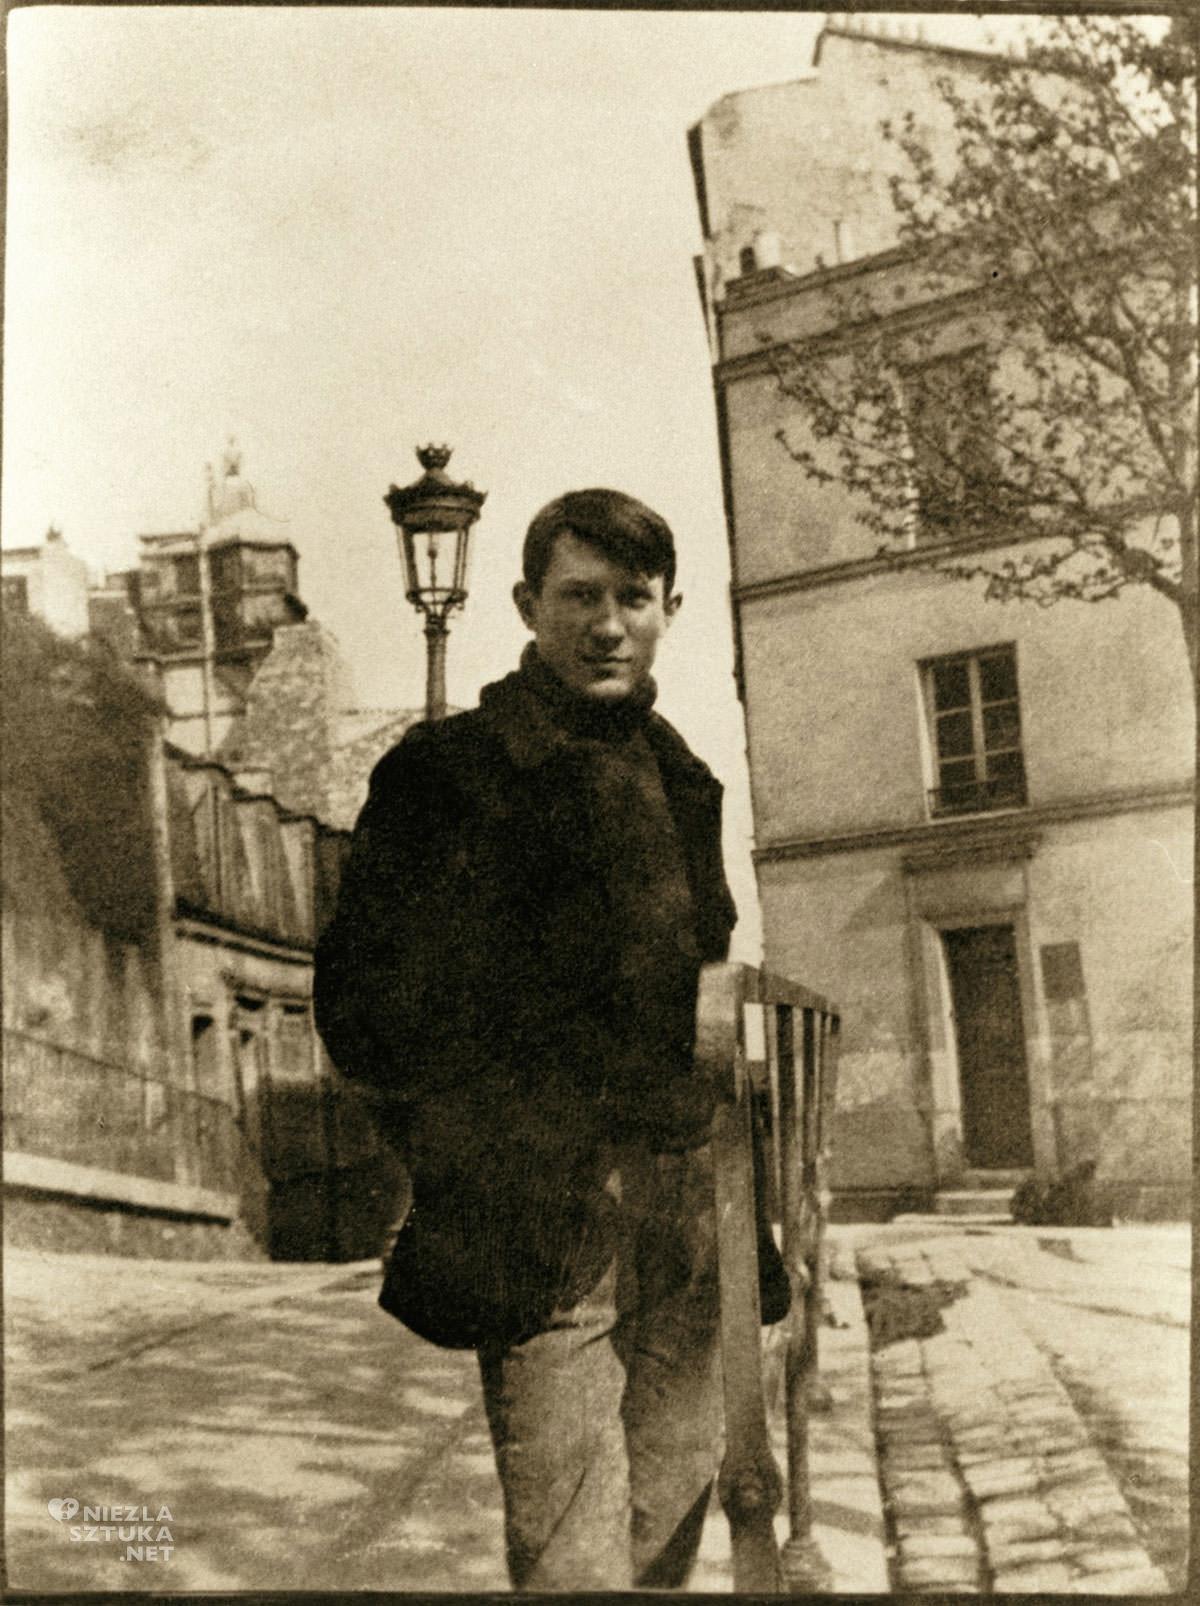 Pablo Picasso, Musée Picasso, Paryż, Niezła sztuka